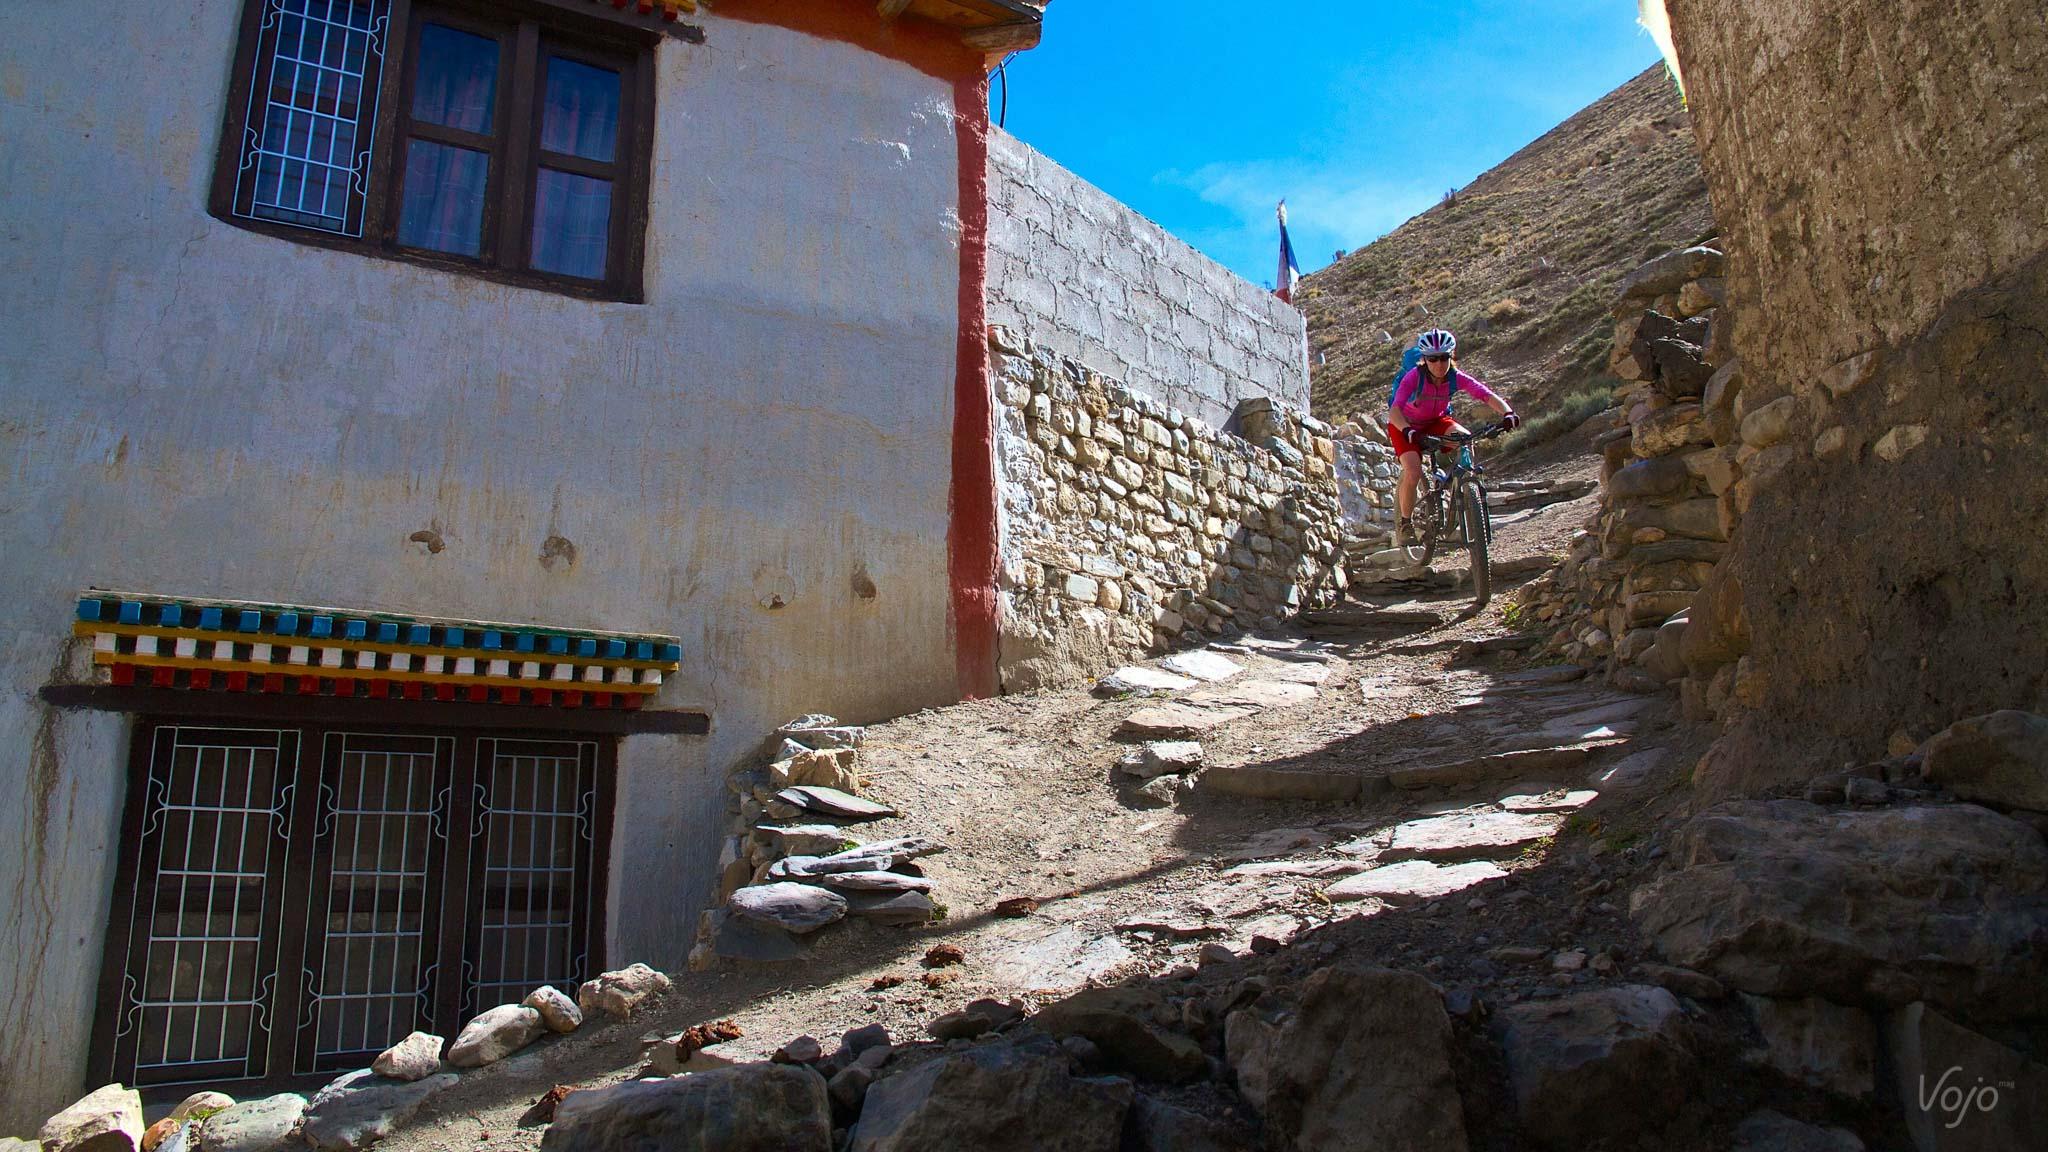 Nepal_Copyright_Molinero_VojoMag-9